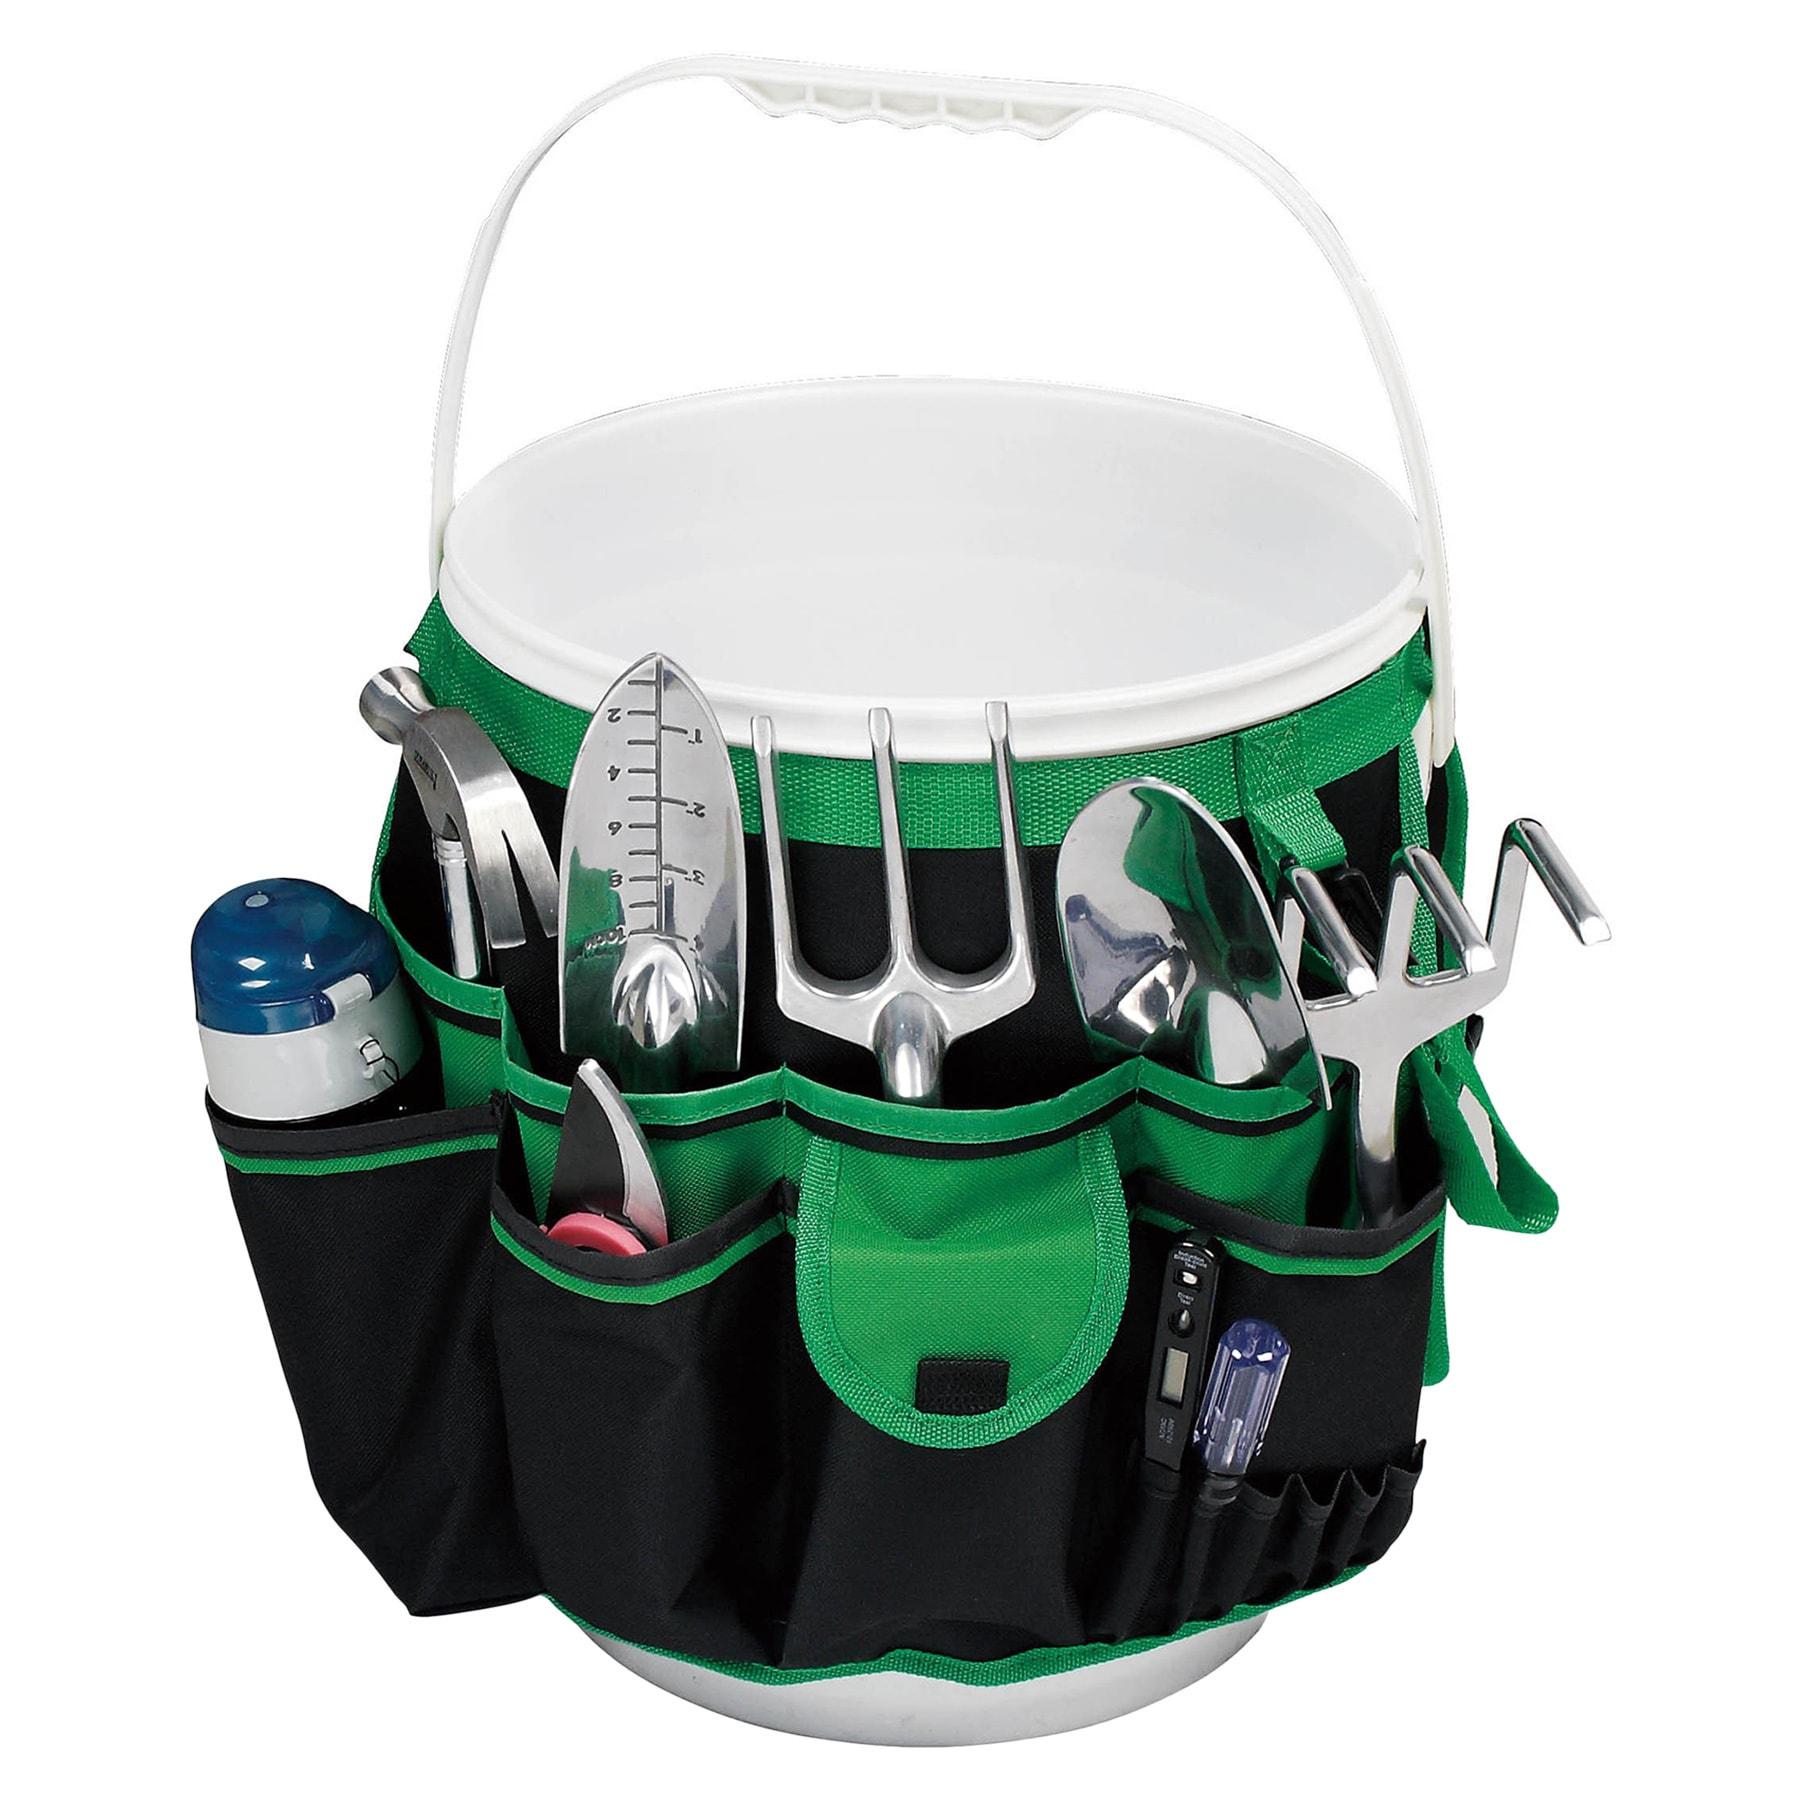 Overstock.com Green Hanging Pocket Organizer for Buckets